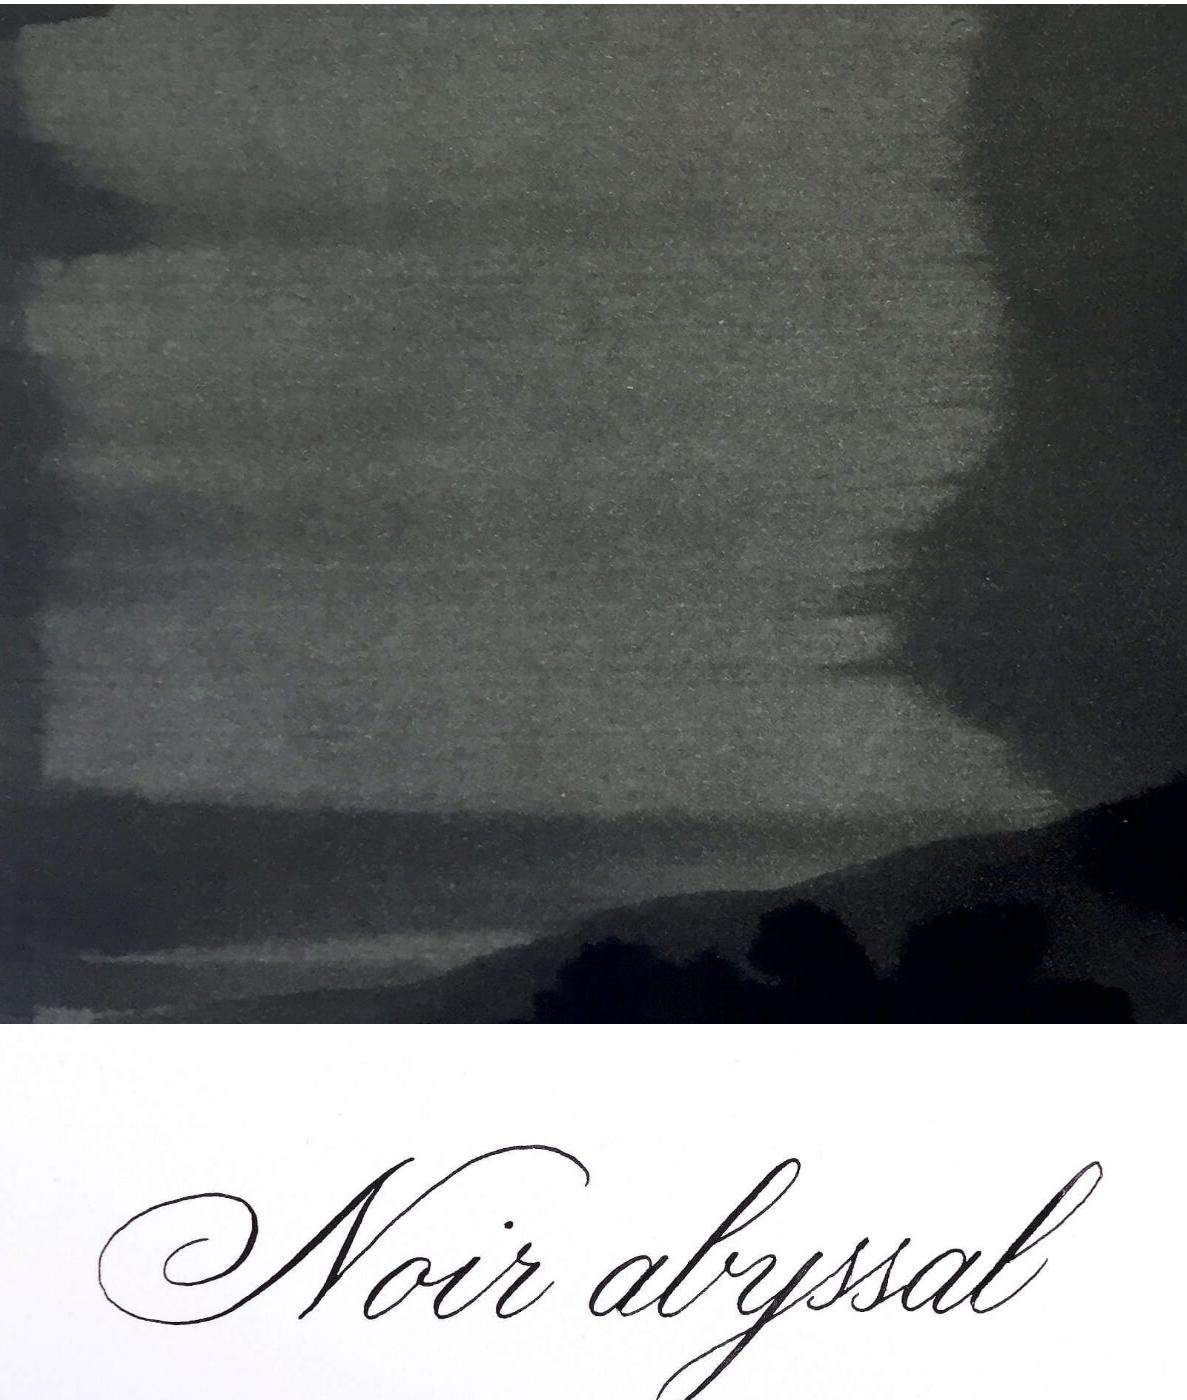 Jacques Herbin  - Noir abyssal  Ink Sample 2ml